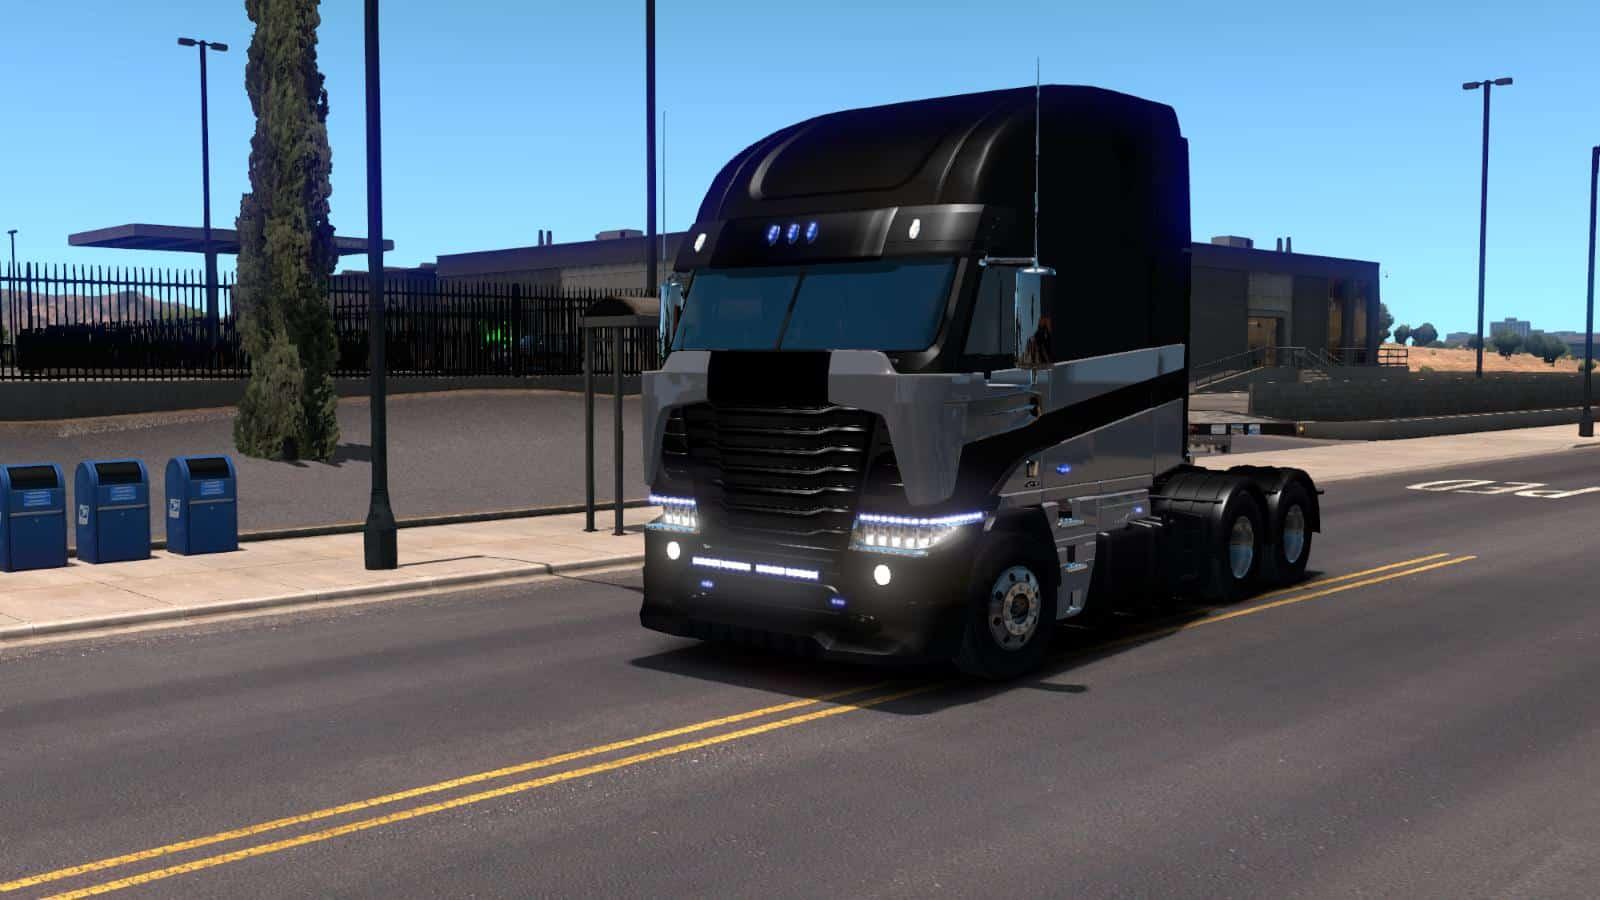 Galvatron TF4 (Freightliner Argosy) Truck (1.31 & UP) ATS ... Freightliner Argosy Galvatron